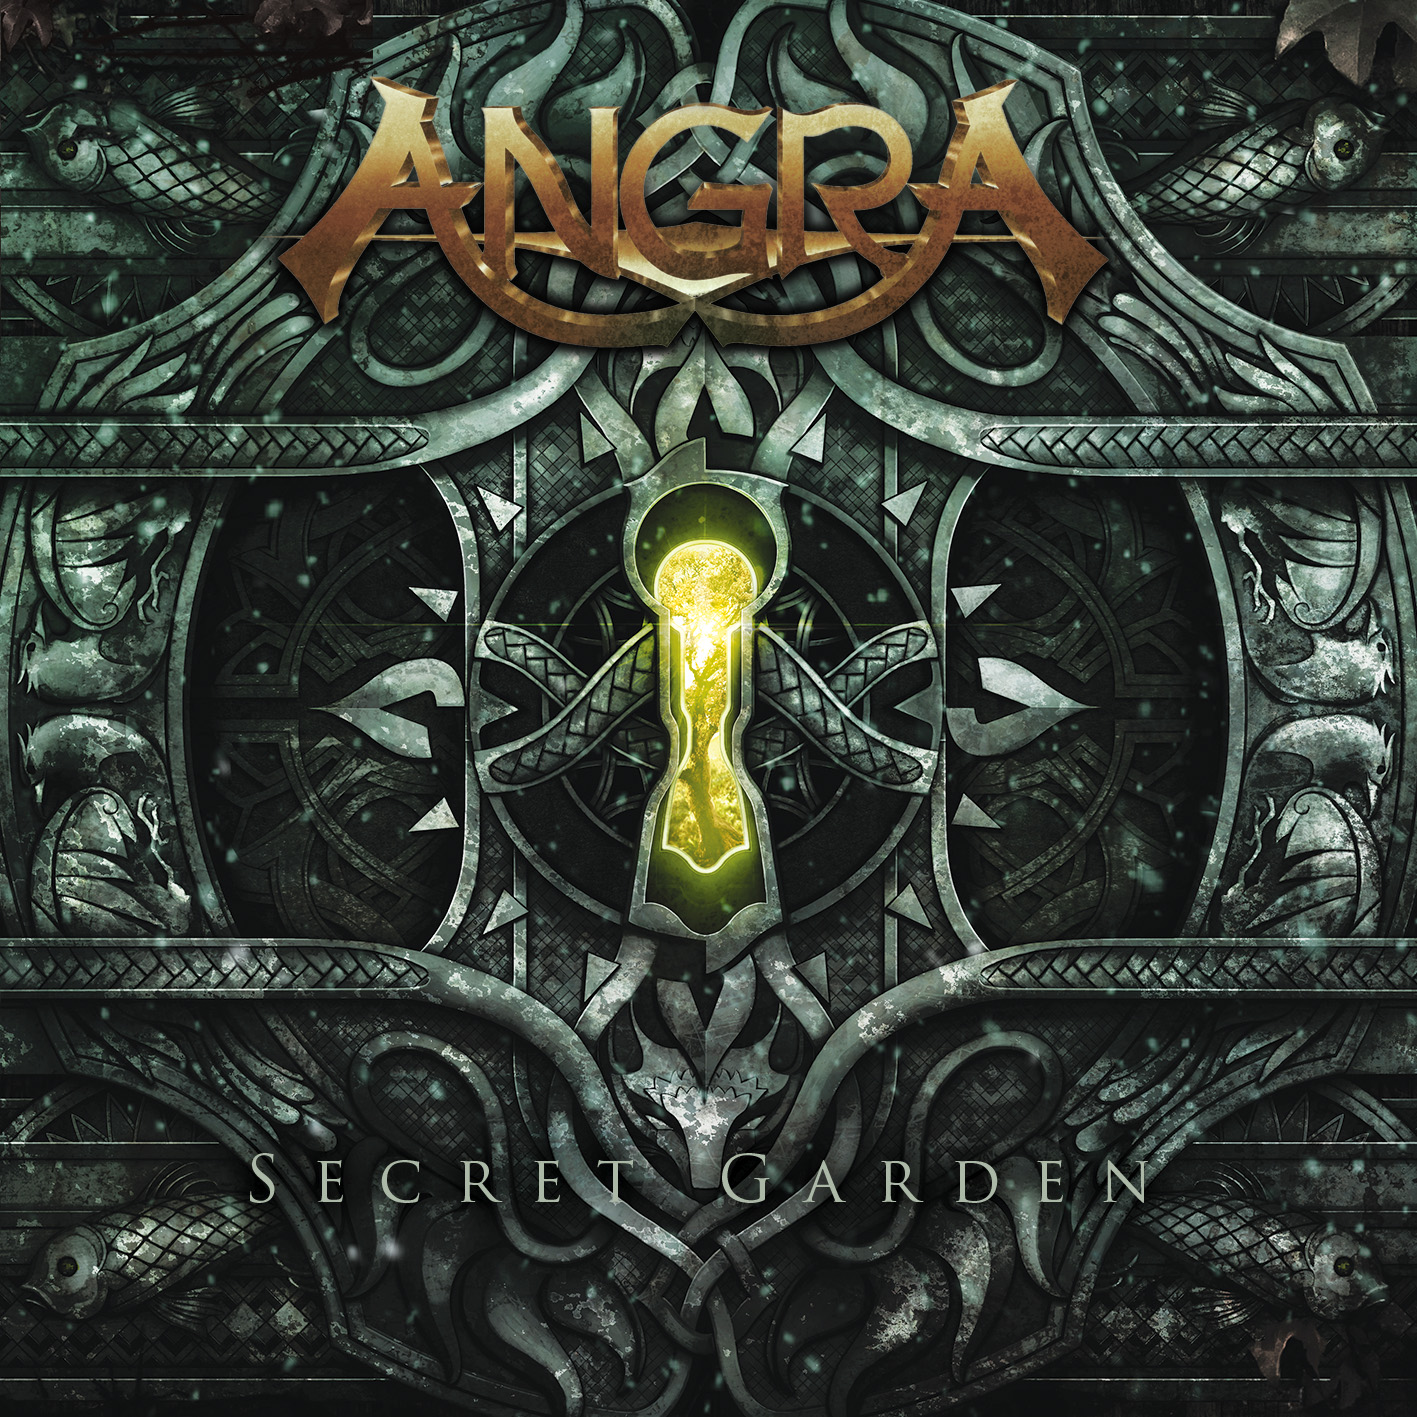 Angra Secret Garden Review Angry Metal Guy